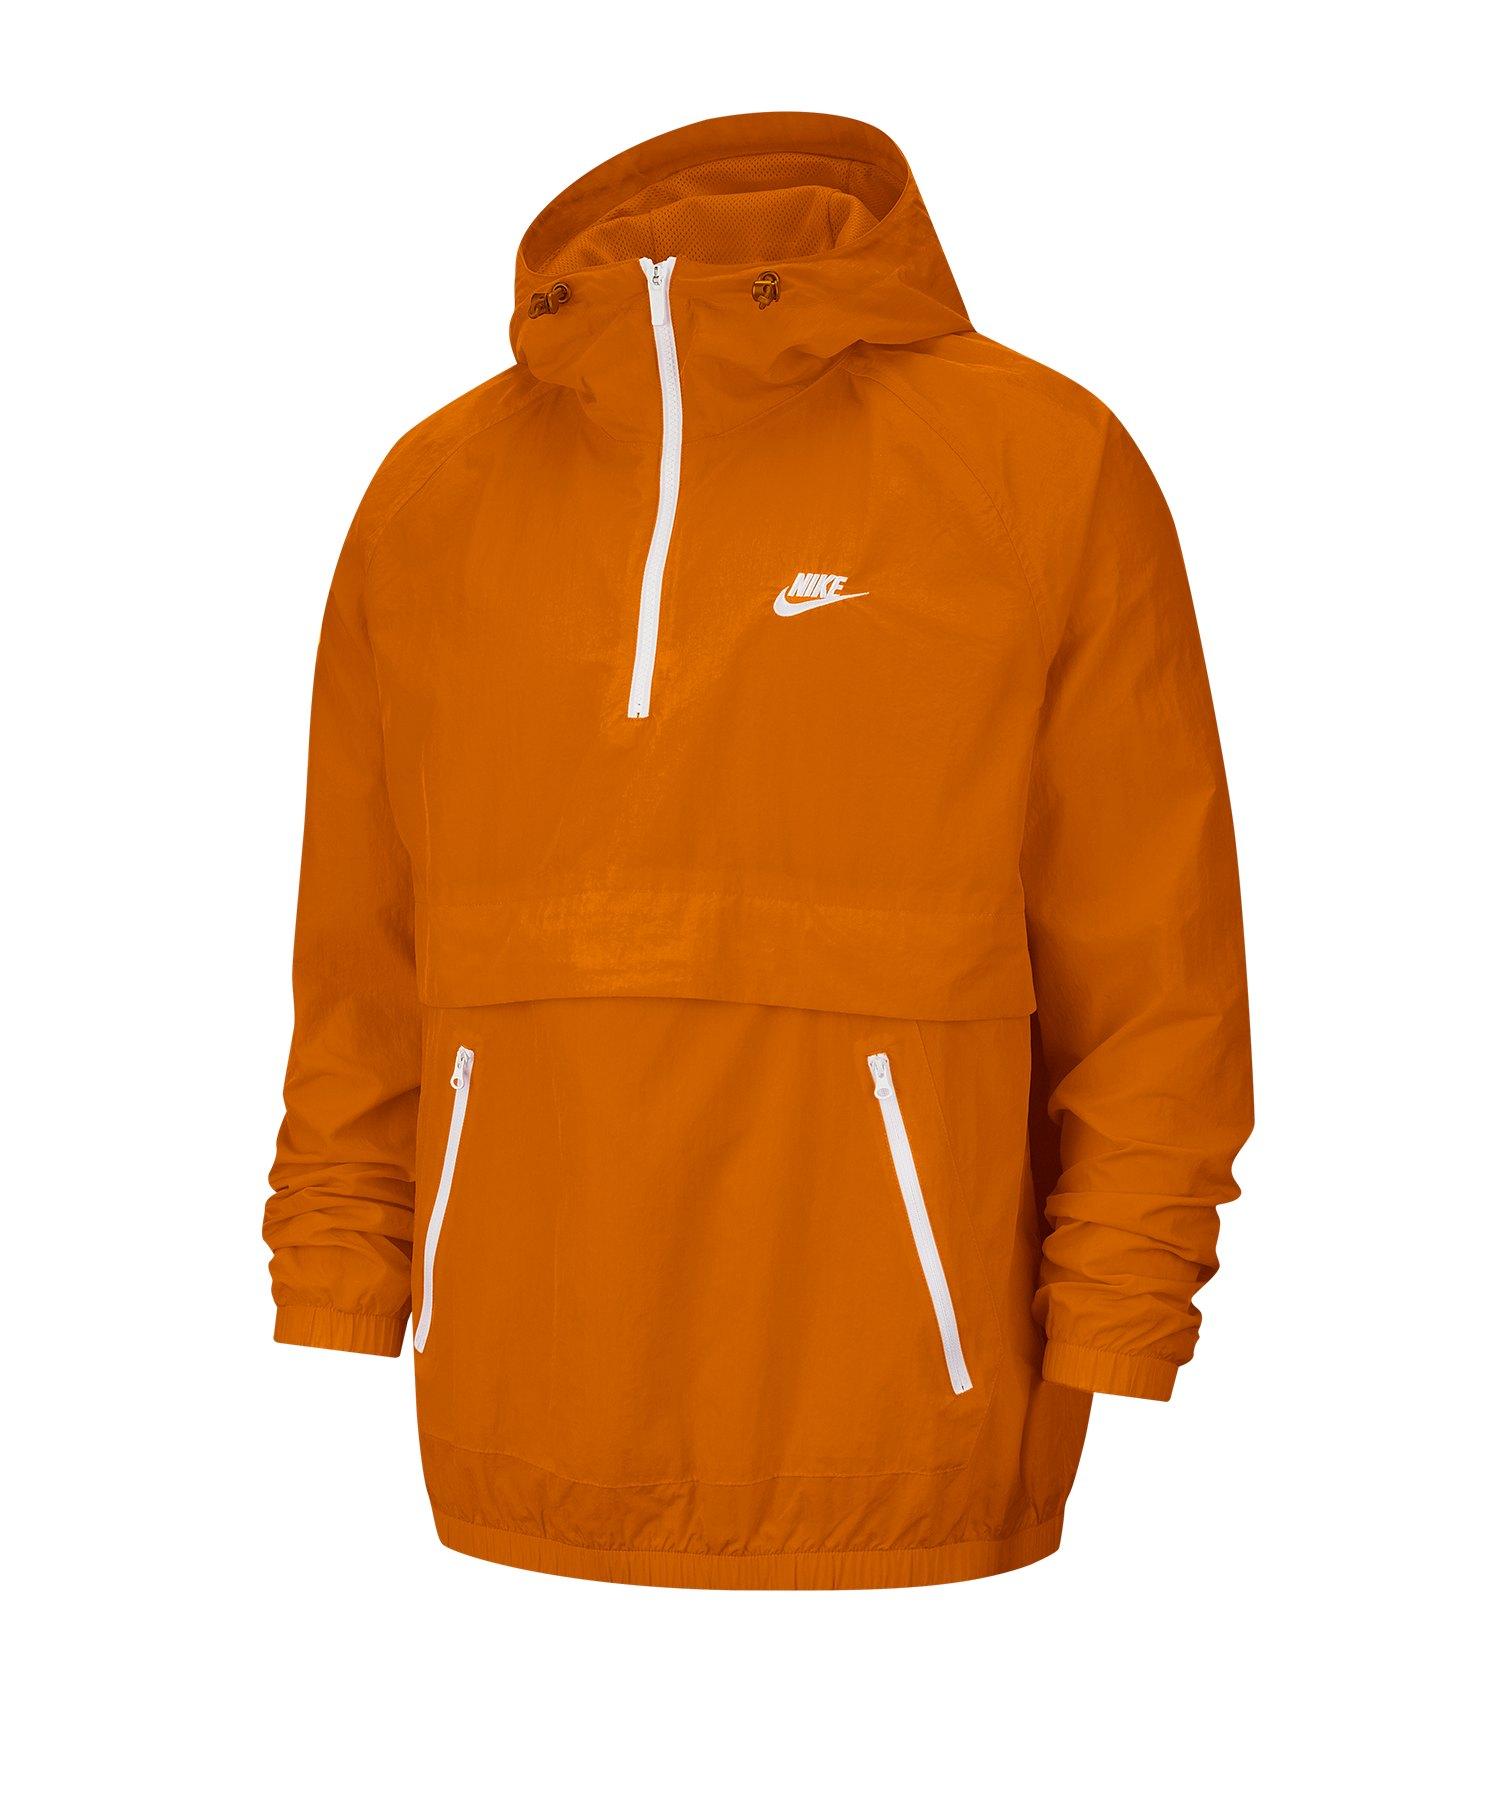 Nike Woven 1/4 Zip Kapuzenwindbreaker Orange F812 - orange